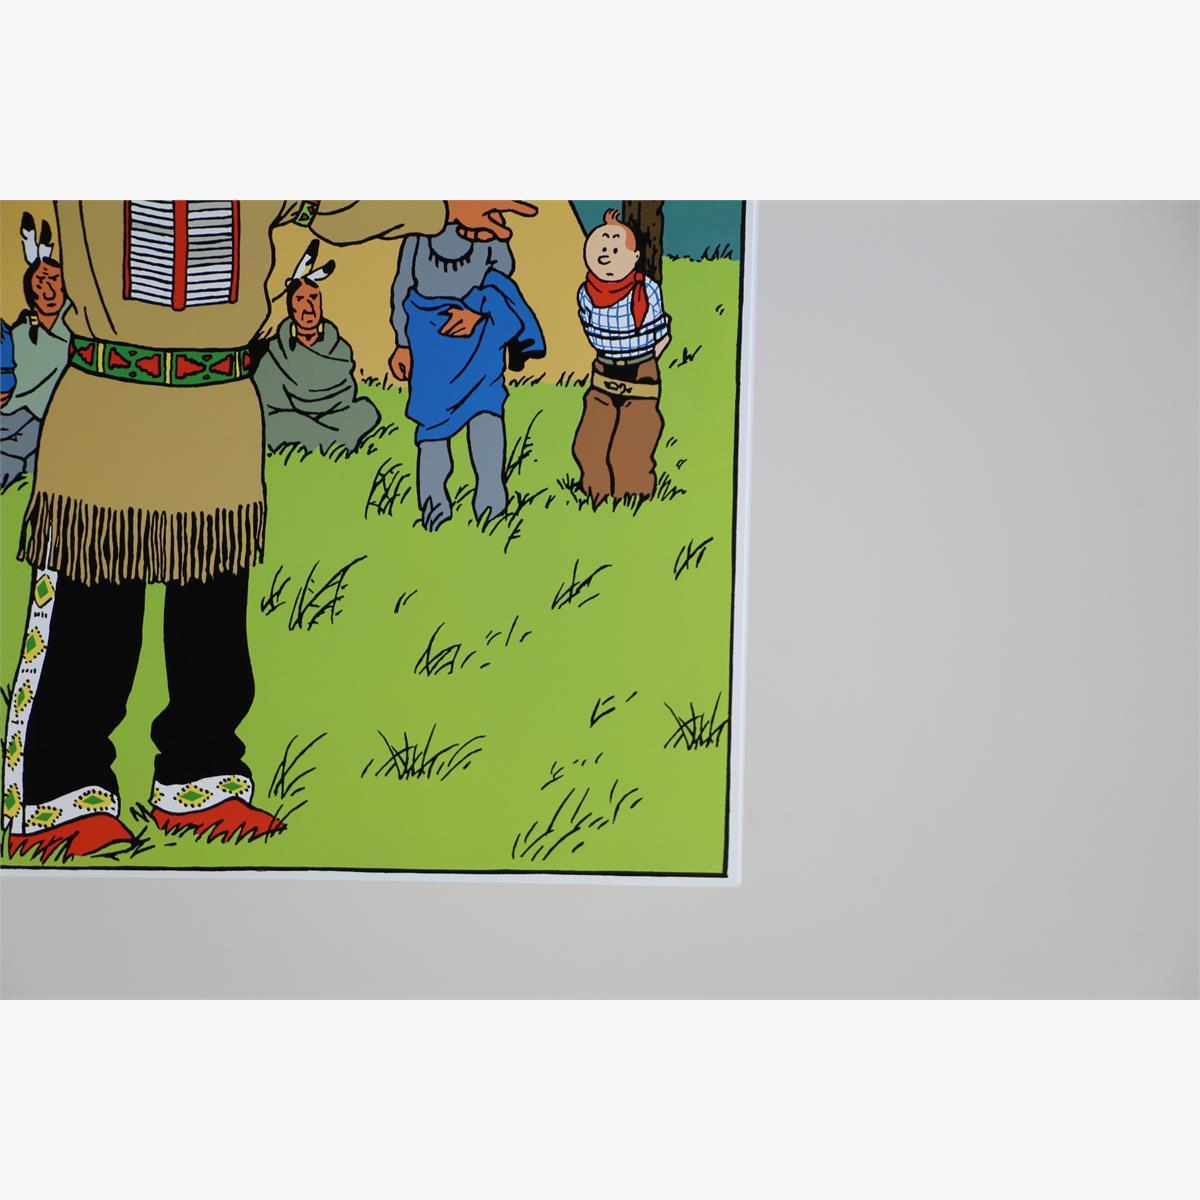 Afbeeldingen van emaille bord kuifje in amerika 1993 oplage 77 ex plaque emaillee tintin en amerique tirage limité 77 ex